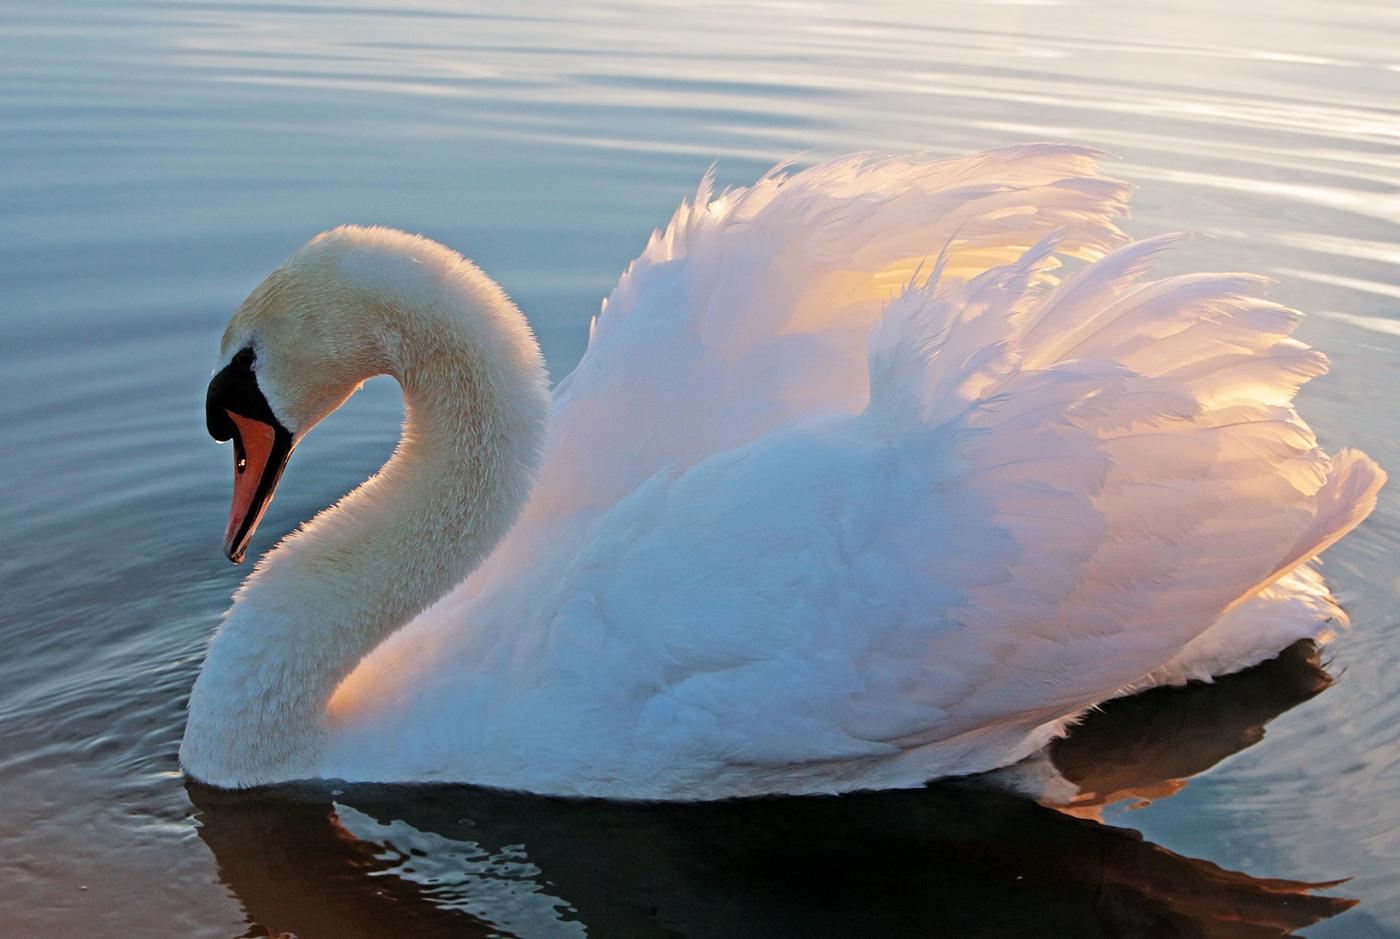 Марта картинки, лебеди картинки фото